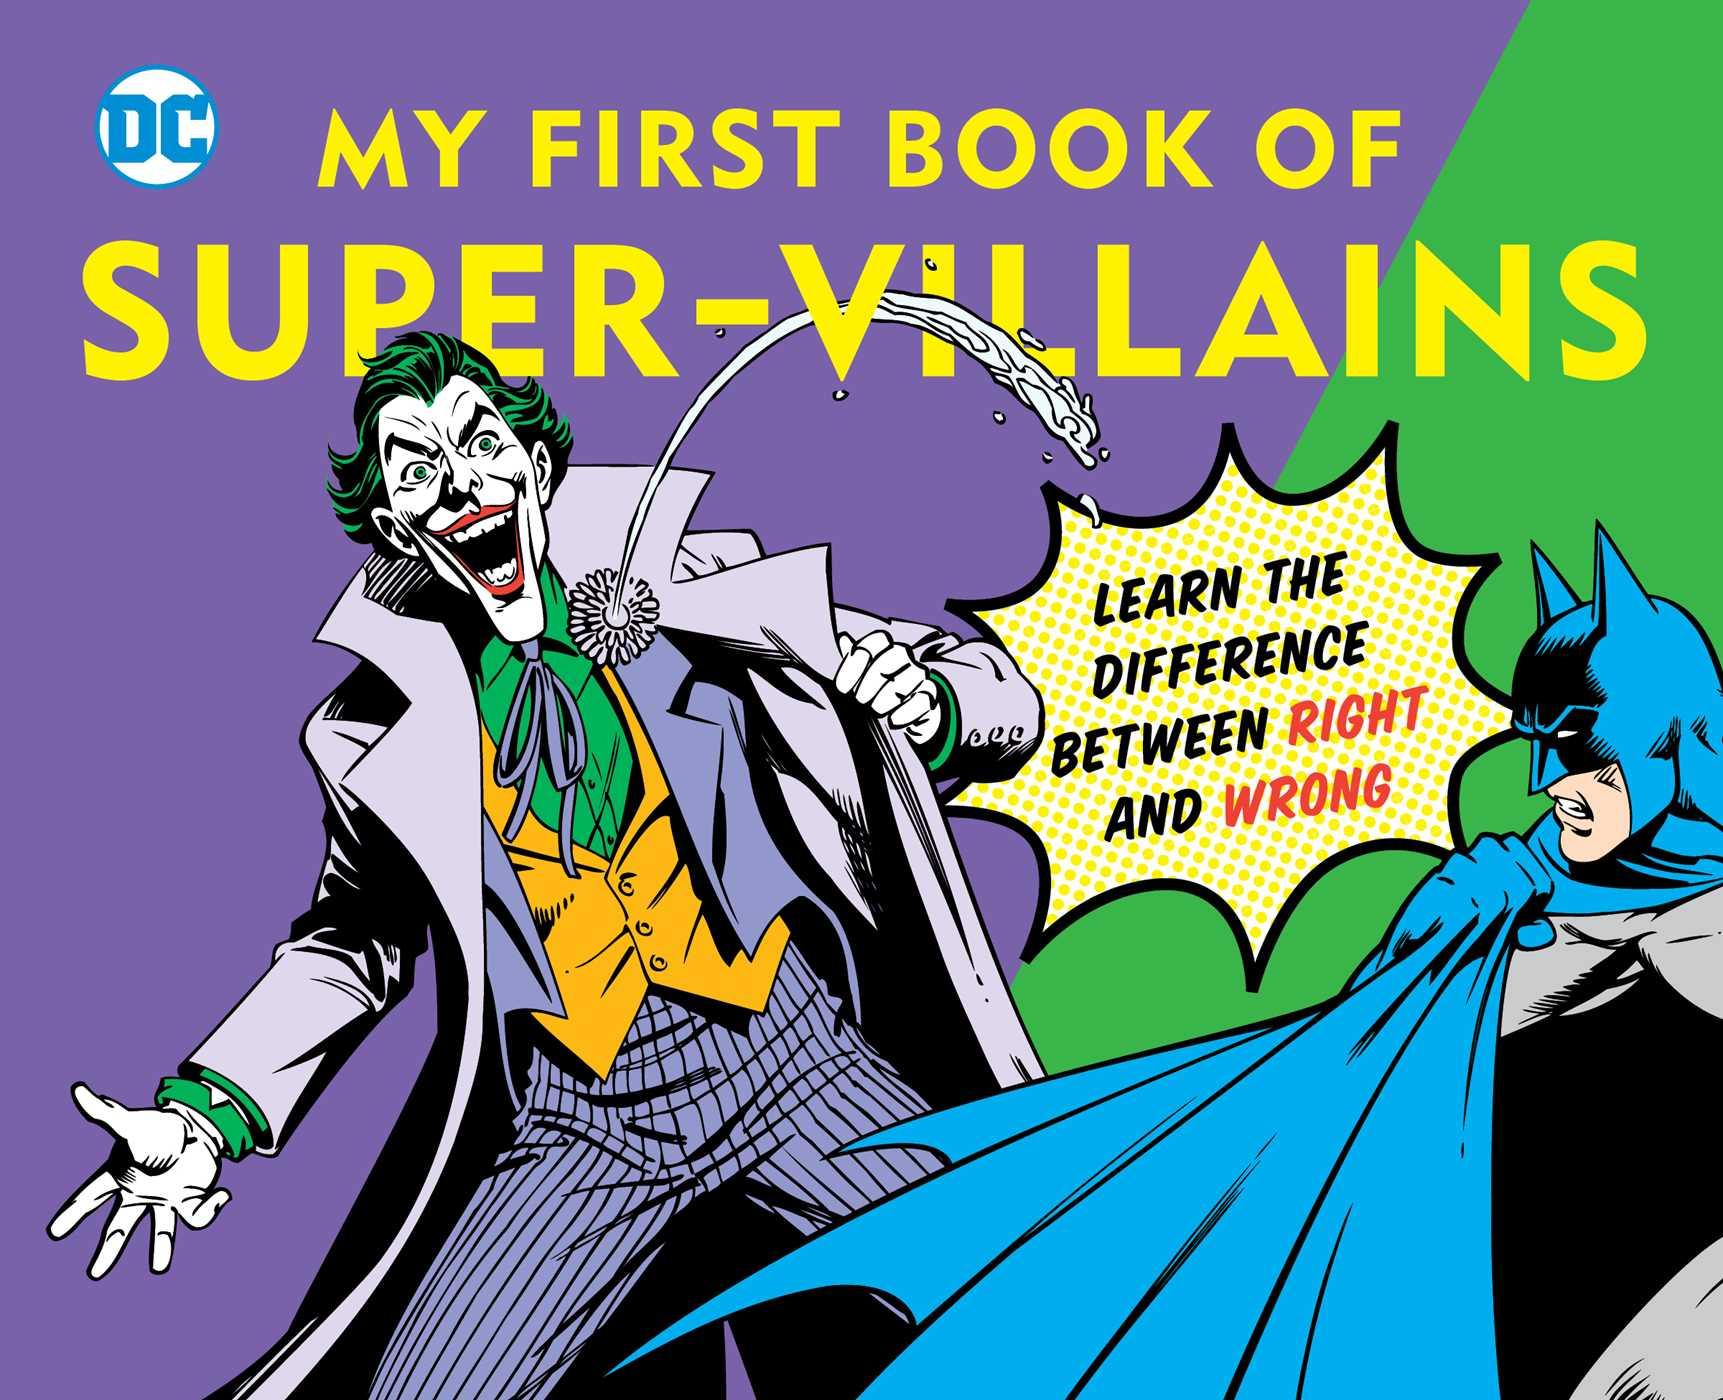 Dc super heroes my first book of super villains 9781935703181 hr